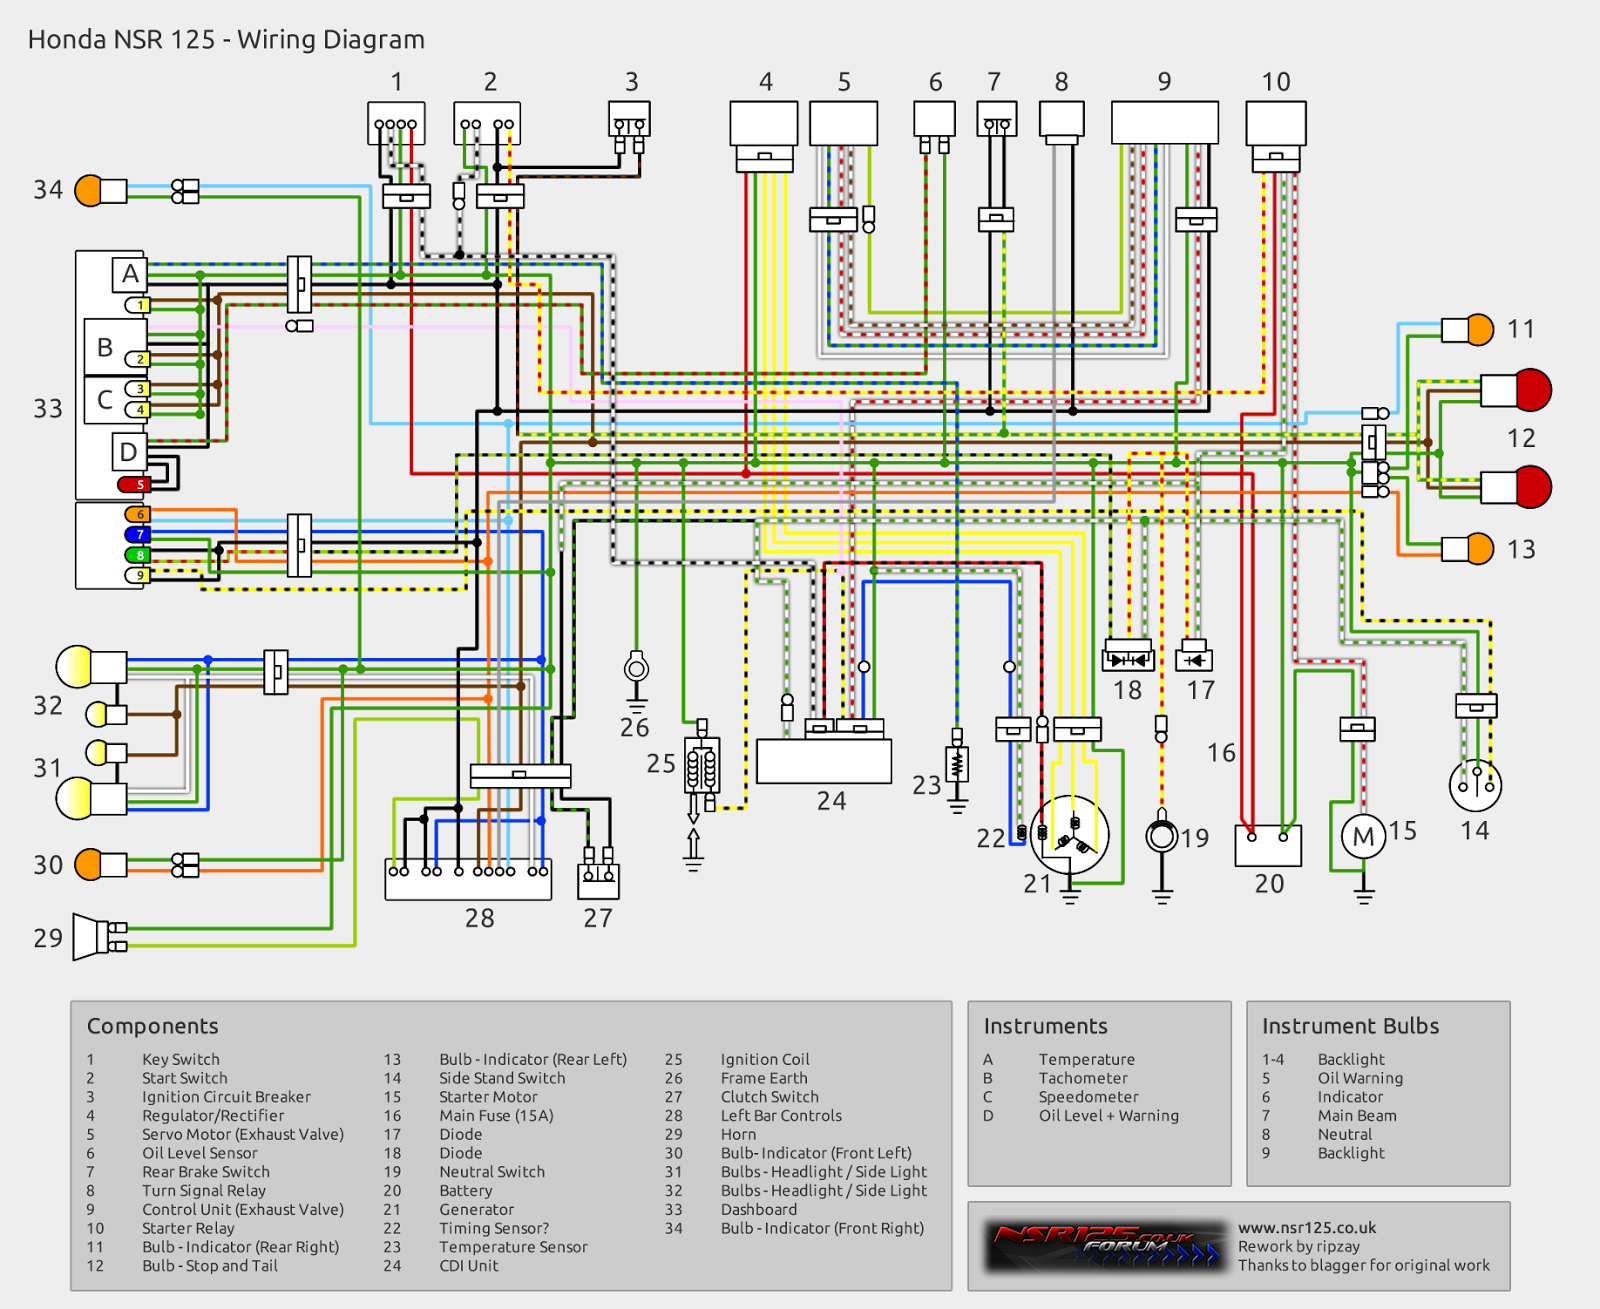 medium resolution of yamaha r6 tail light wiring diagram suzuki c50 wiring 2003 yamaha r1 wiring diagram 2000 yamaha r1 service manual